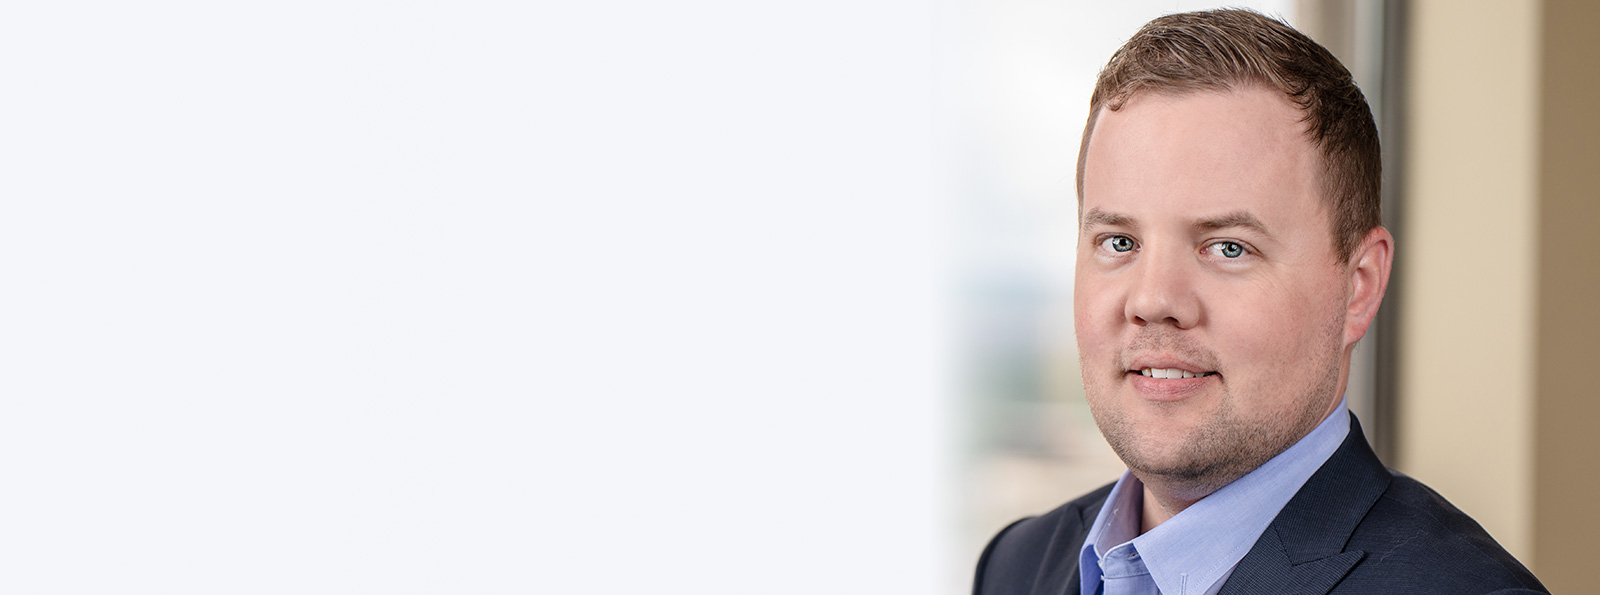 Photo of Matt Landry, business, real estate an estate planning lawyer at Kelly Santini LLP in Ottawa